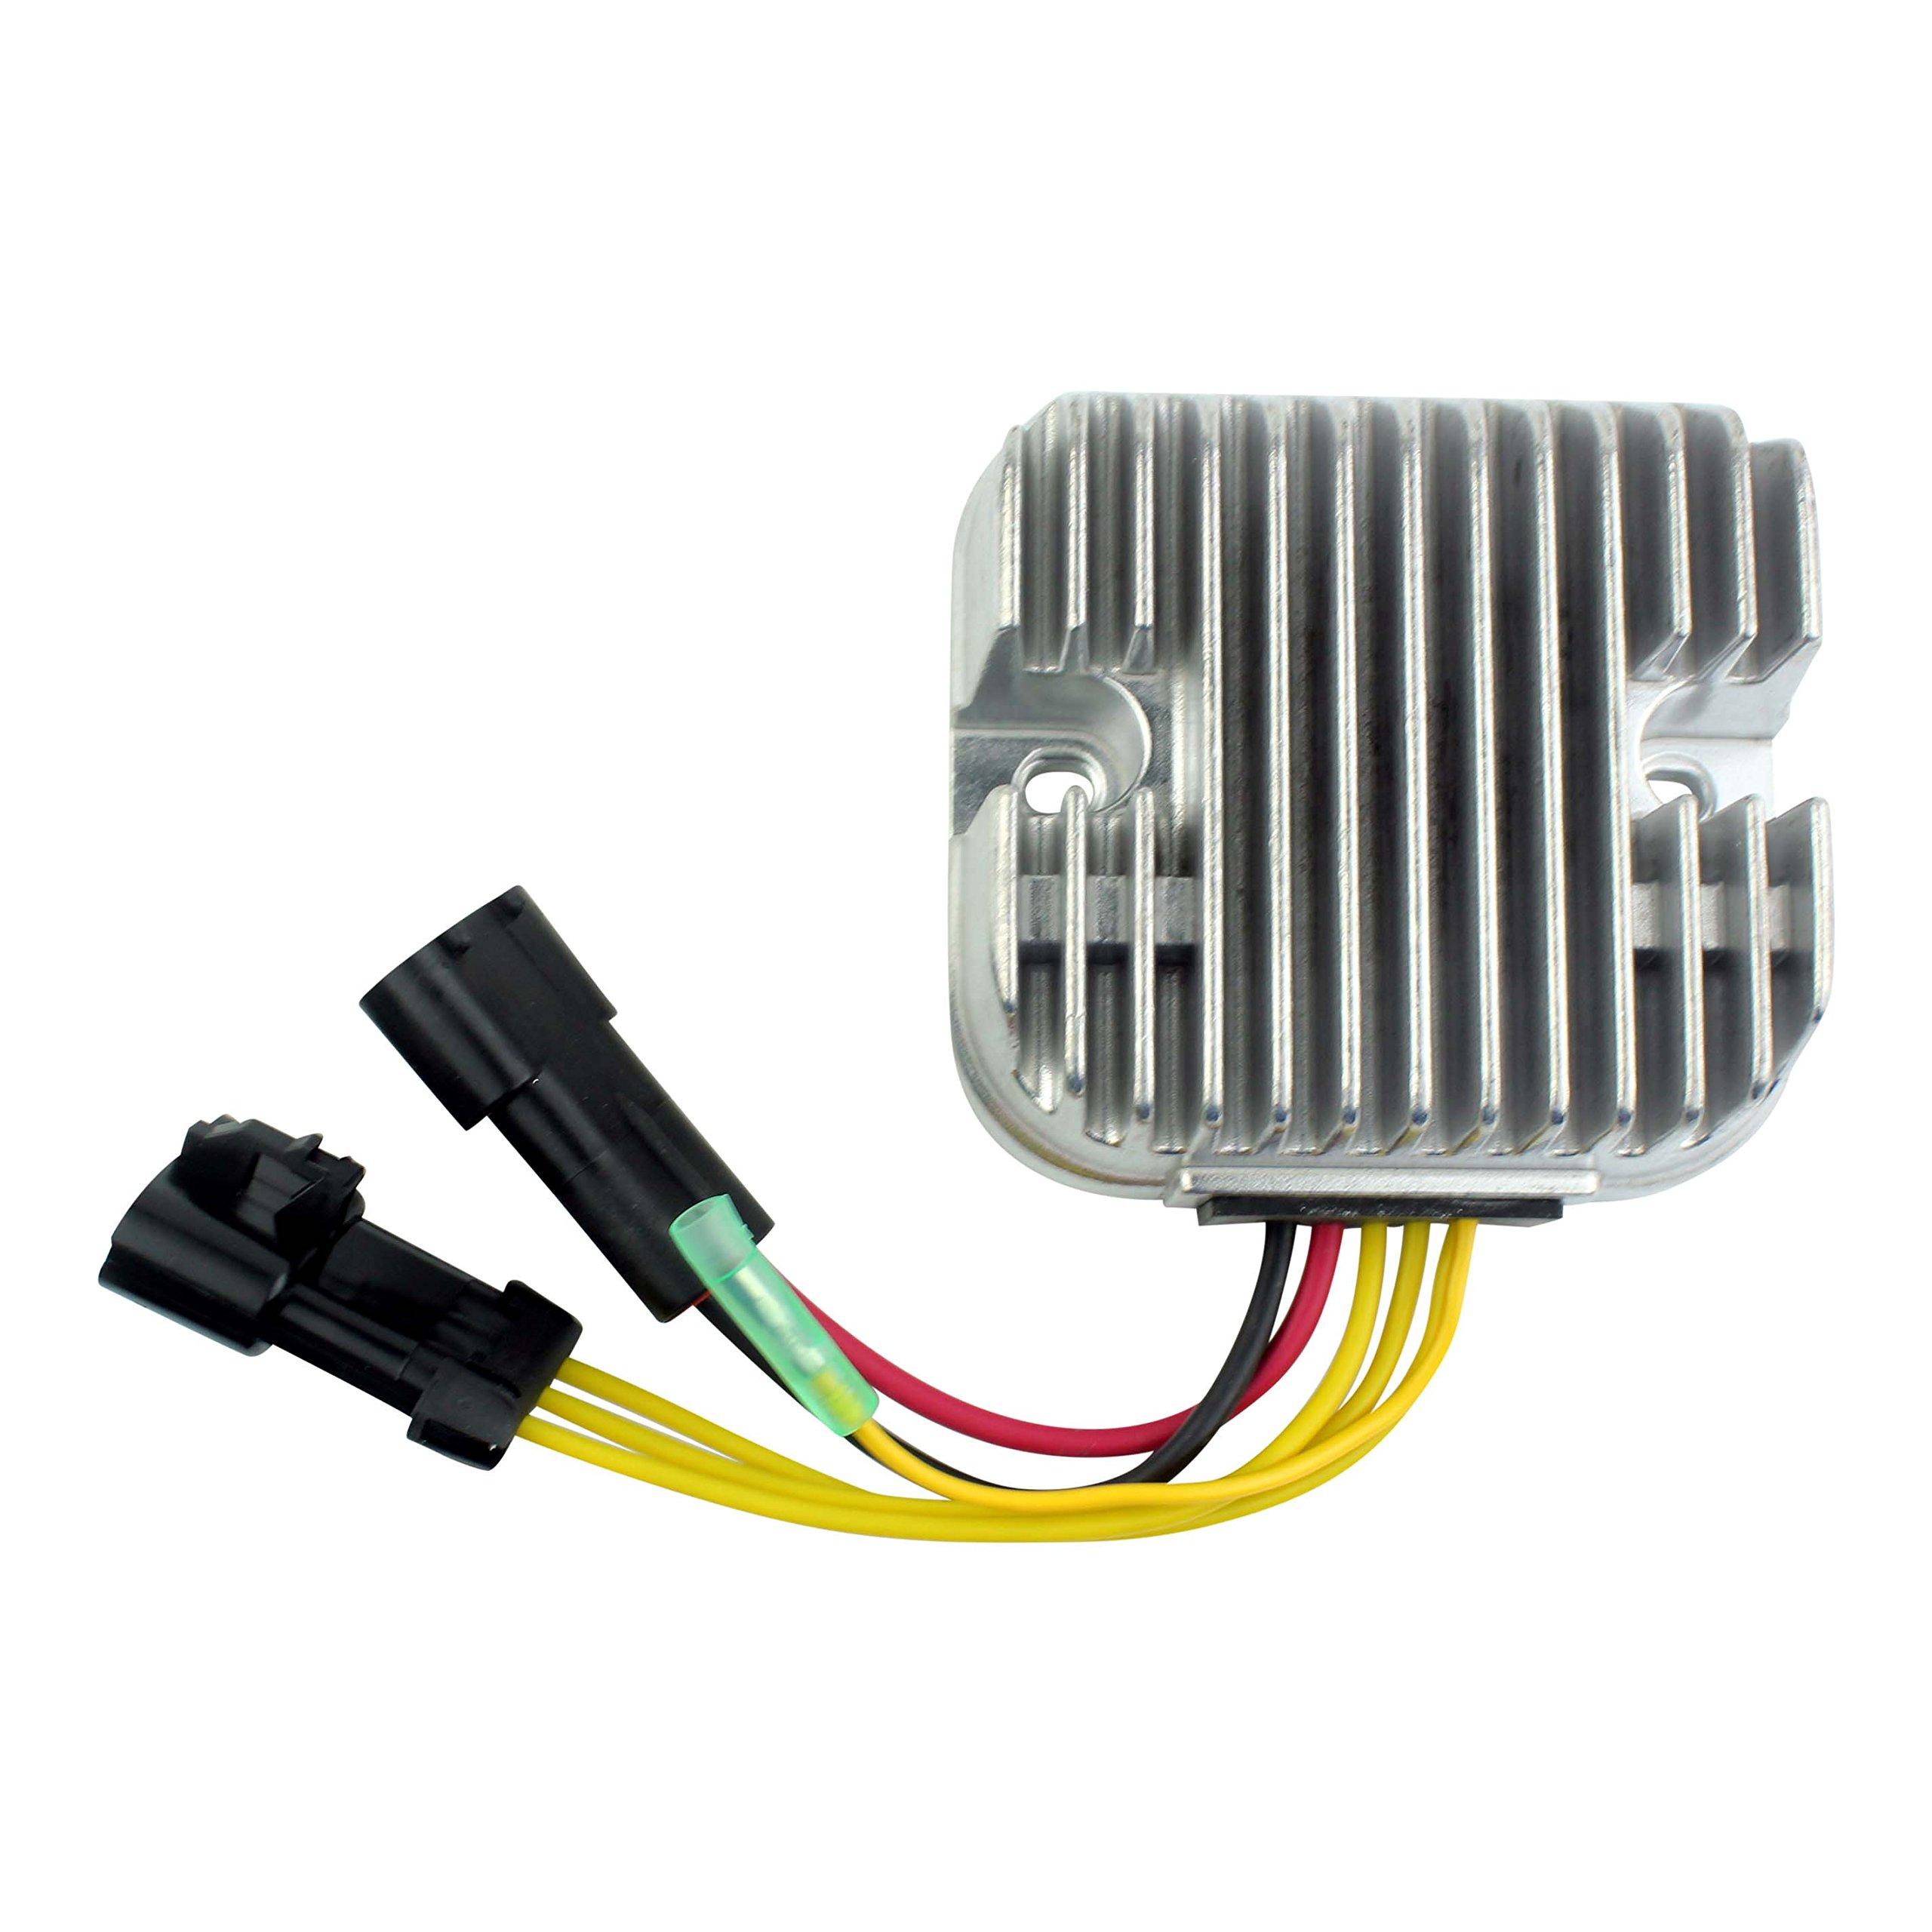 Mosfet Voltage Regulator Rectifier For Polaris RZR 800 Sportsman 800/500 Ranger 500/800 2010 2011 2012 2013 2014 OEM Repl.# 4012748 by RMSTATOR (Image #7)